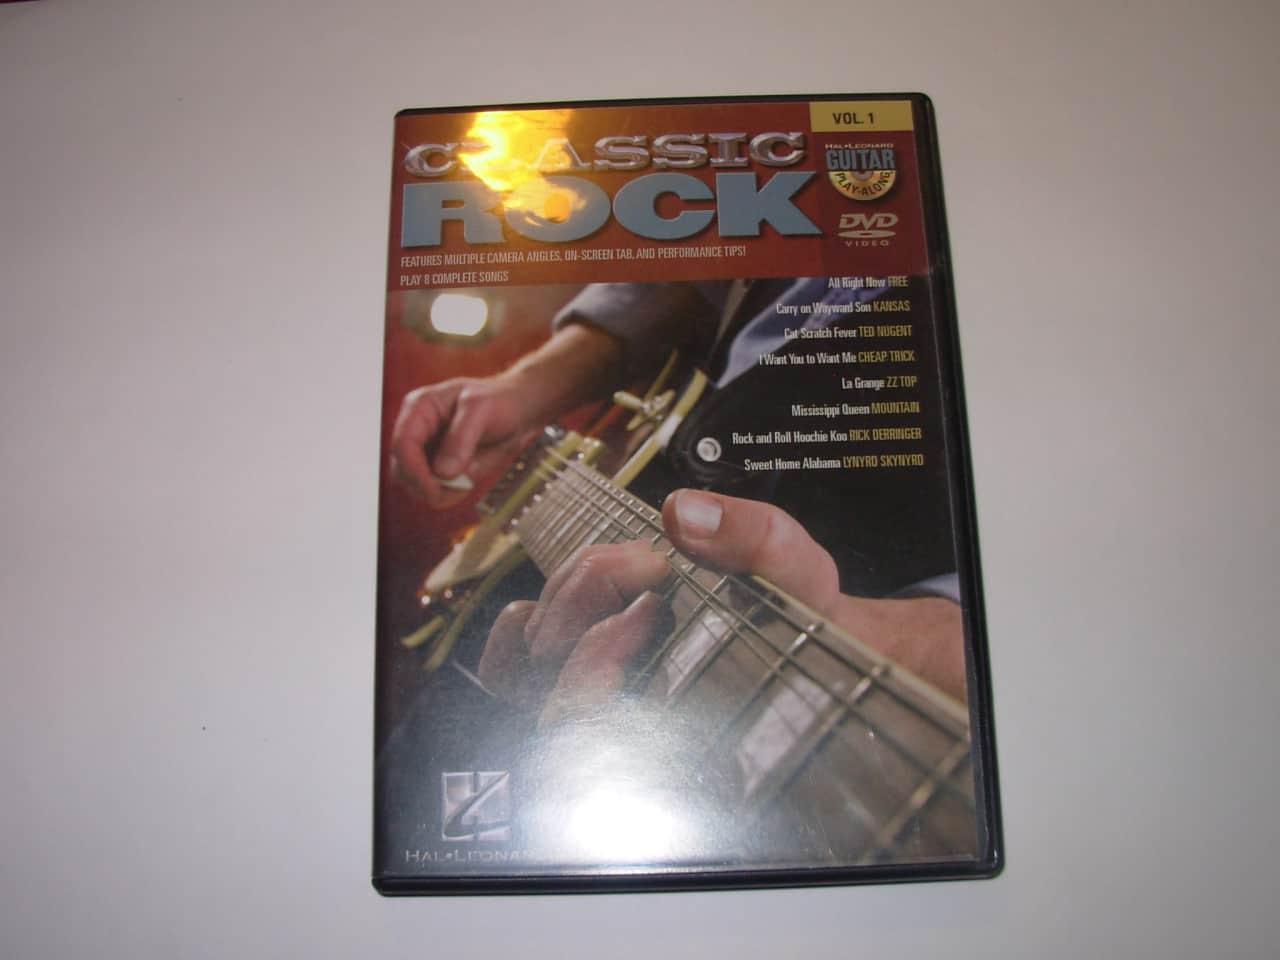 Hal Leonard Classic Rock Dvd Guitar Play Along Vol1 Dvd Reverb